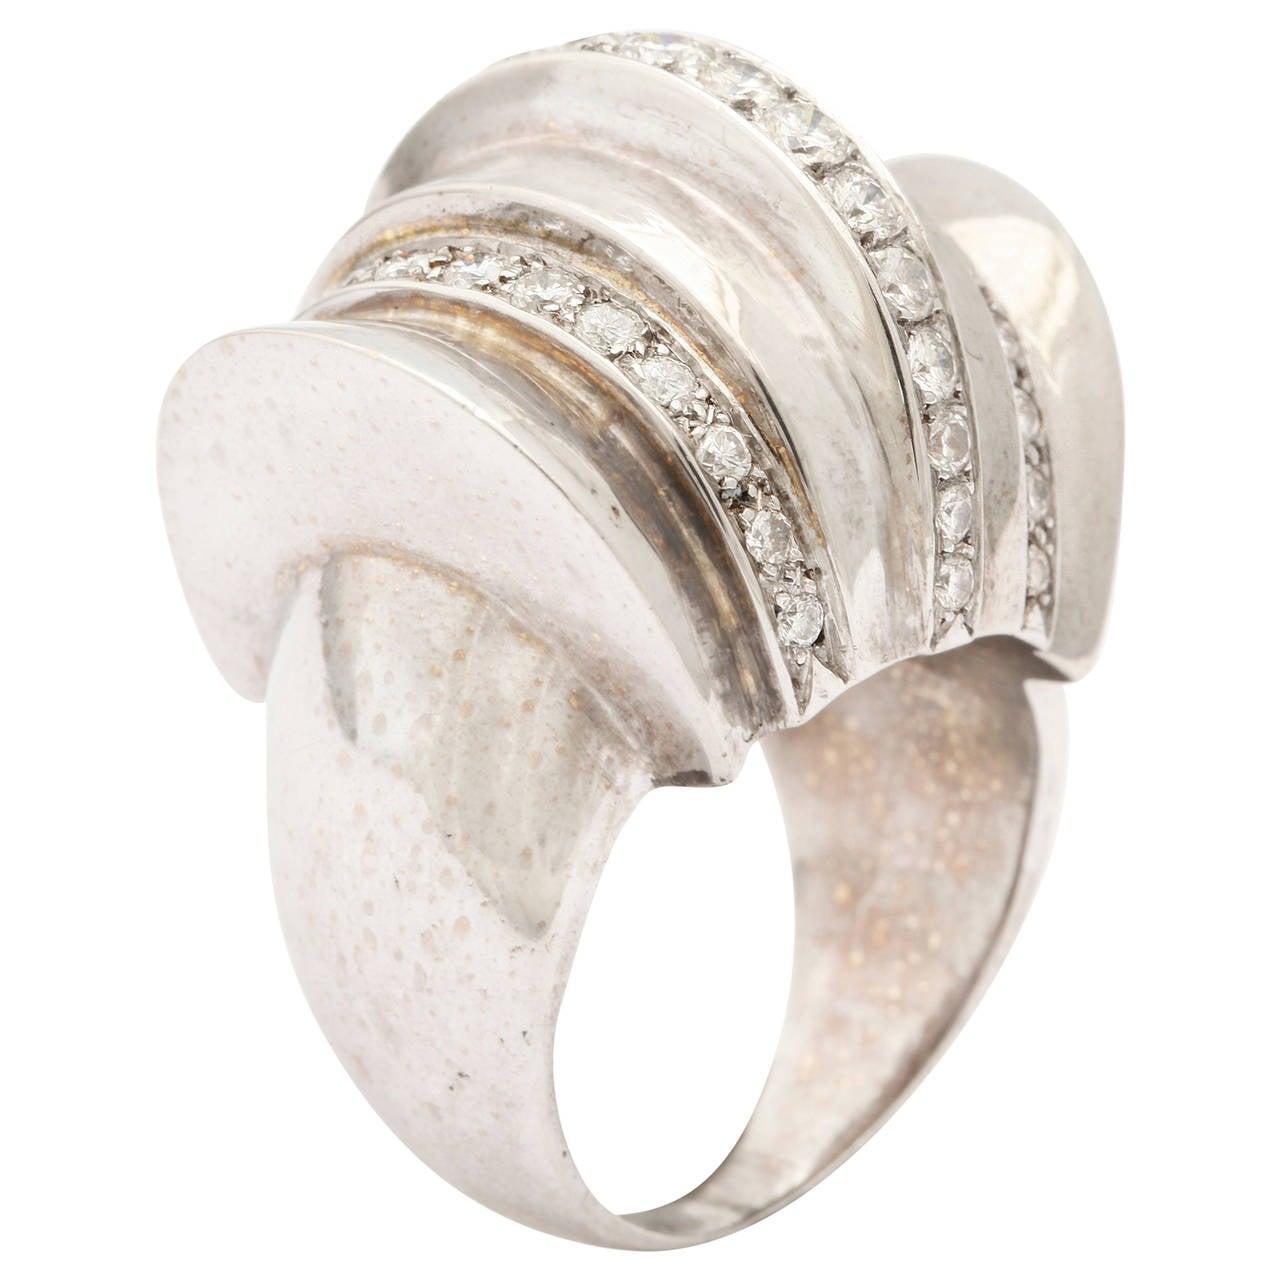 1940s Retro Diamond Gold Cocktail Ring